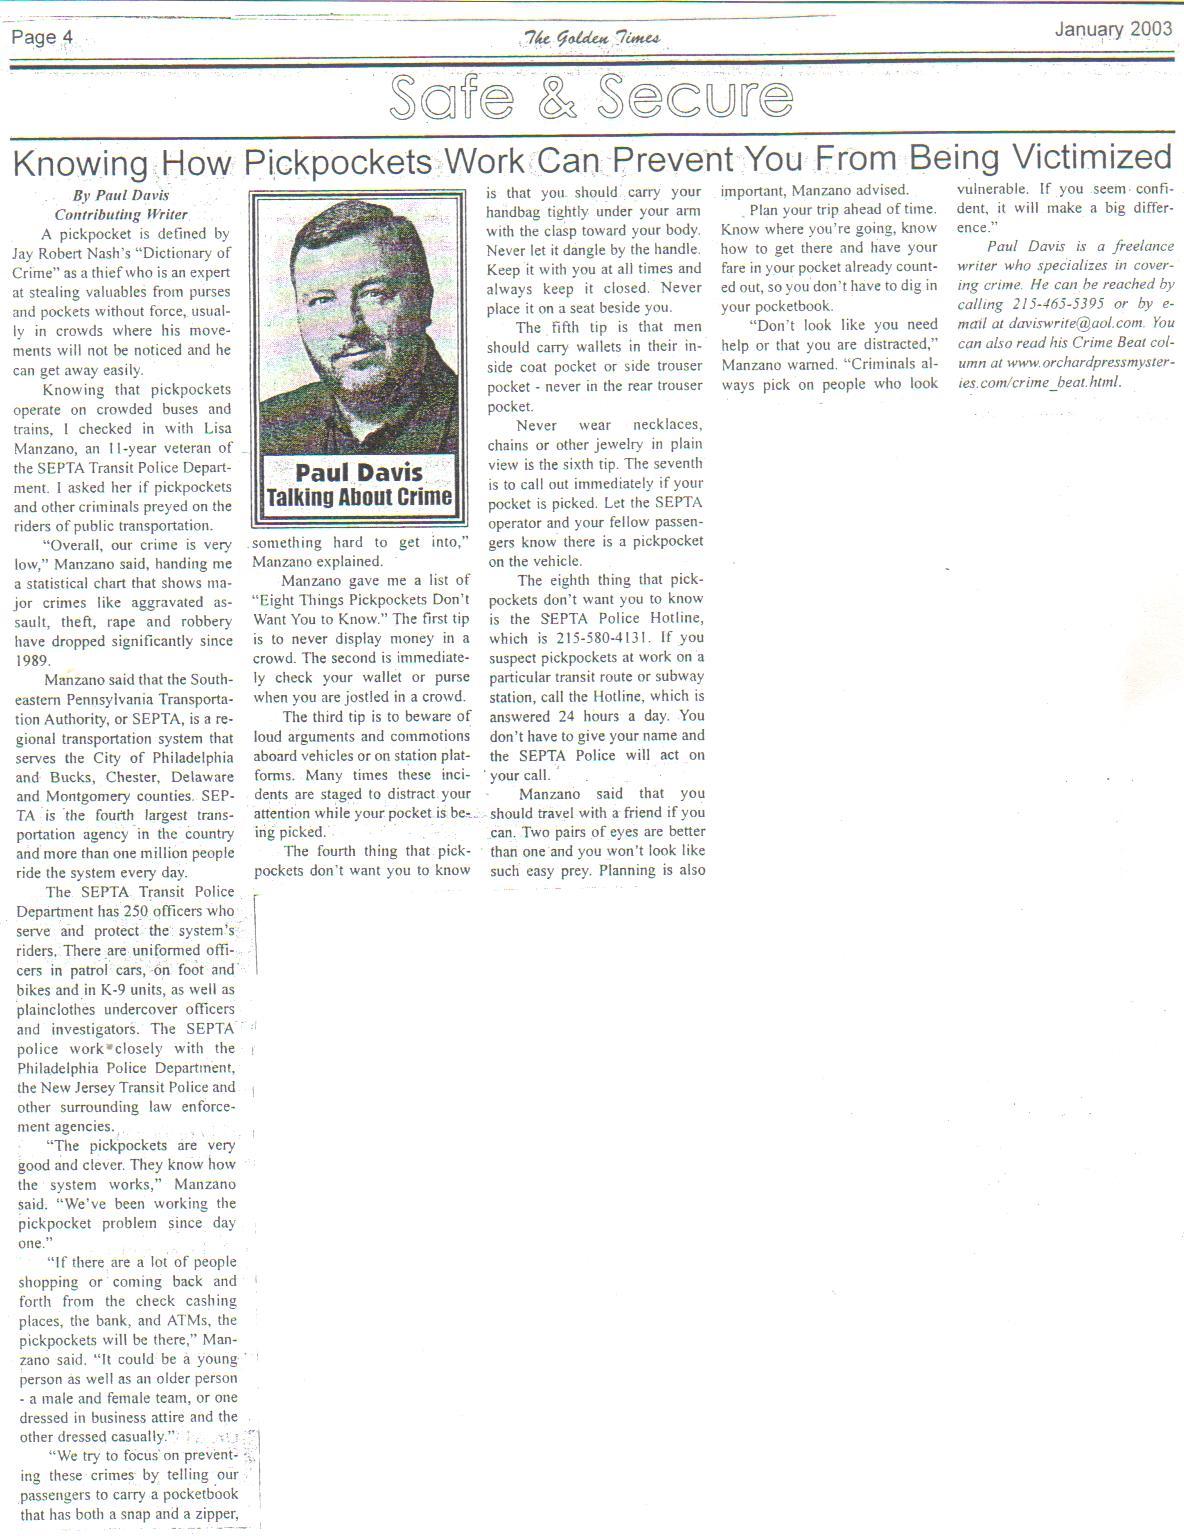 Paul Davis On Crime: Three Of My Newspaper Crime